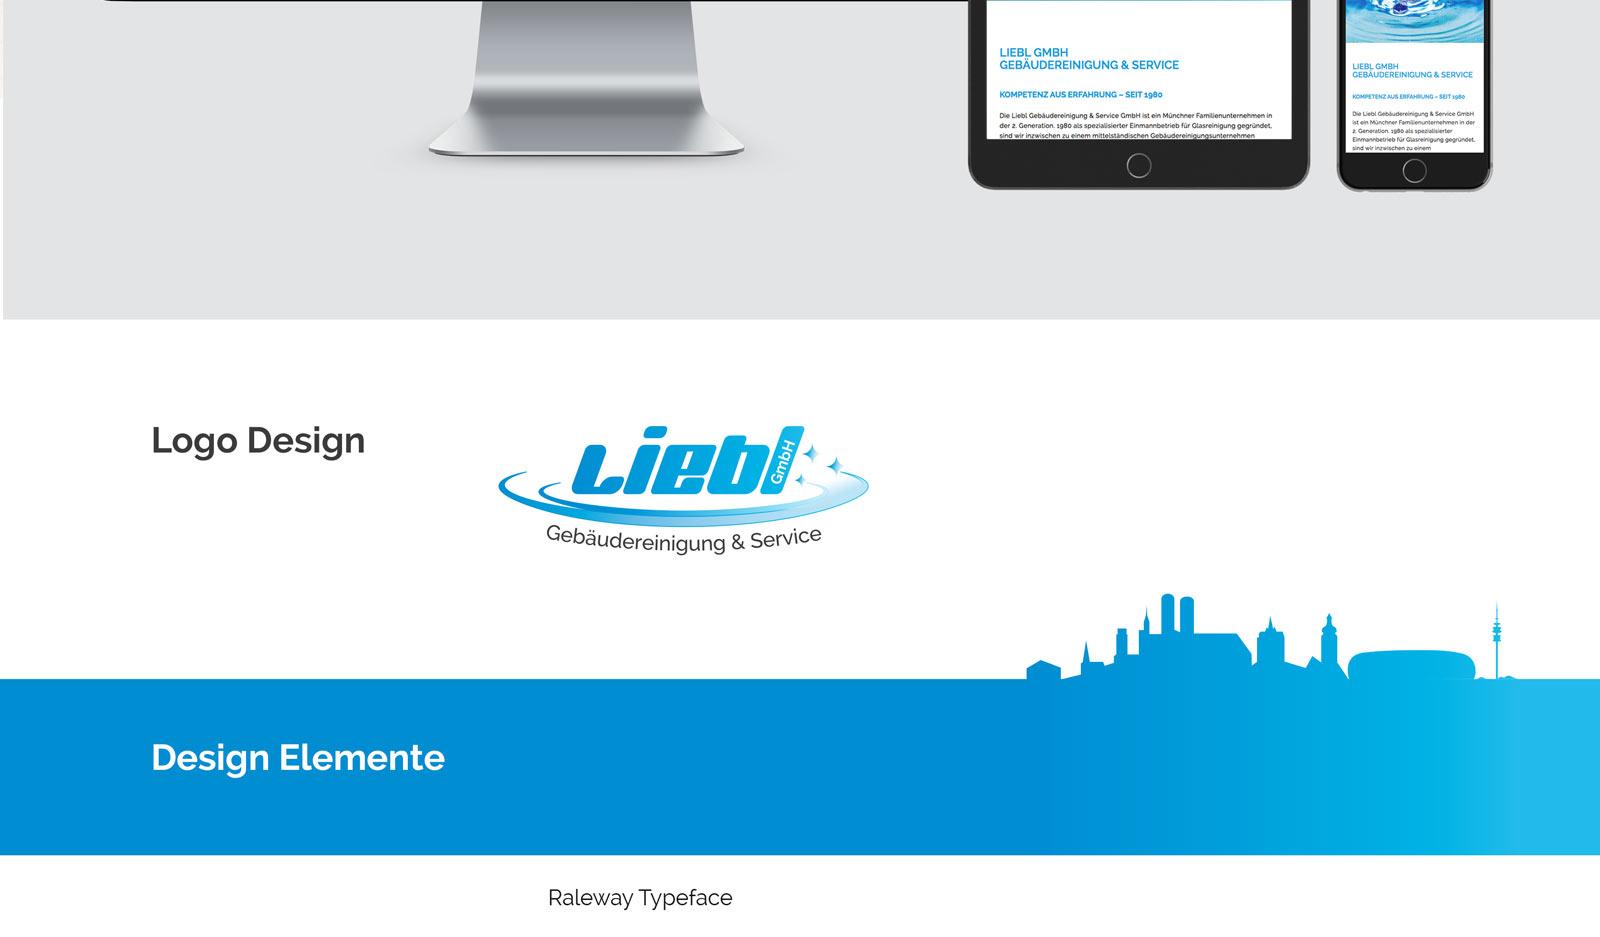 Liebl_Logo_Design_2.jpg